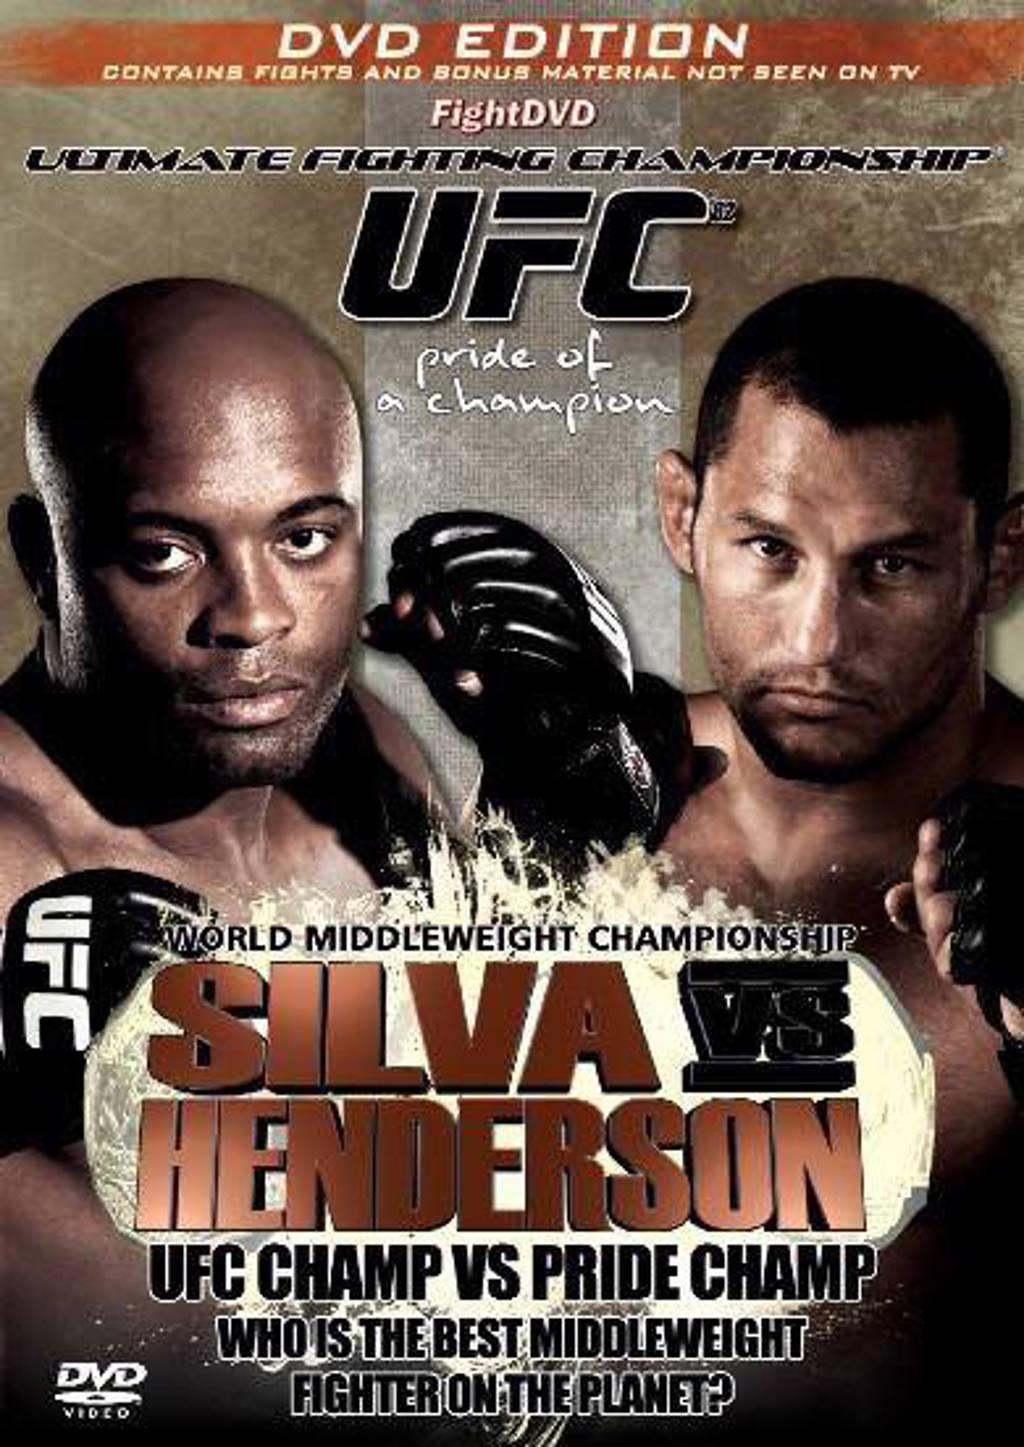 UFC - UFC 82 pride of a champion (DVD)